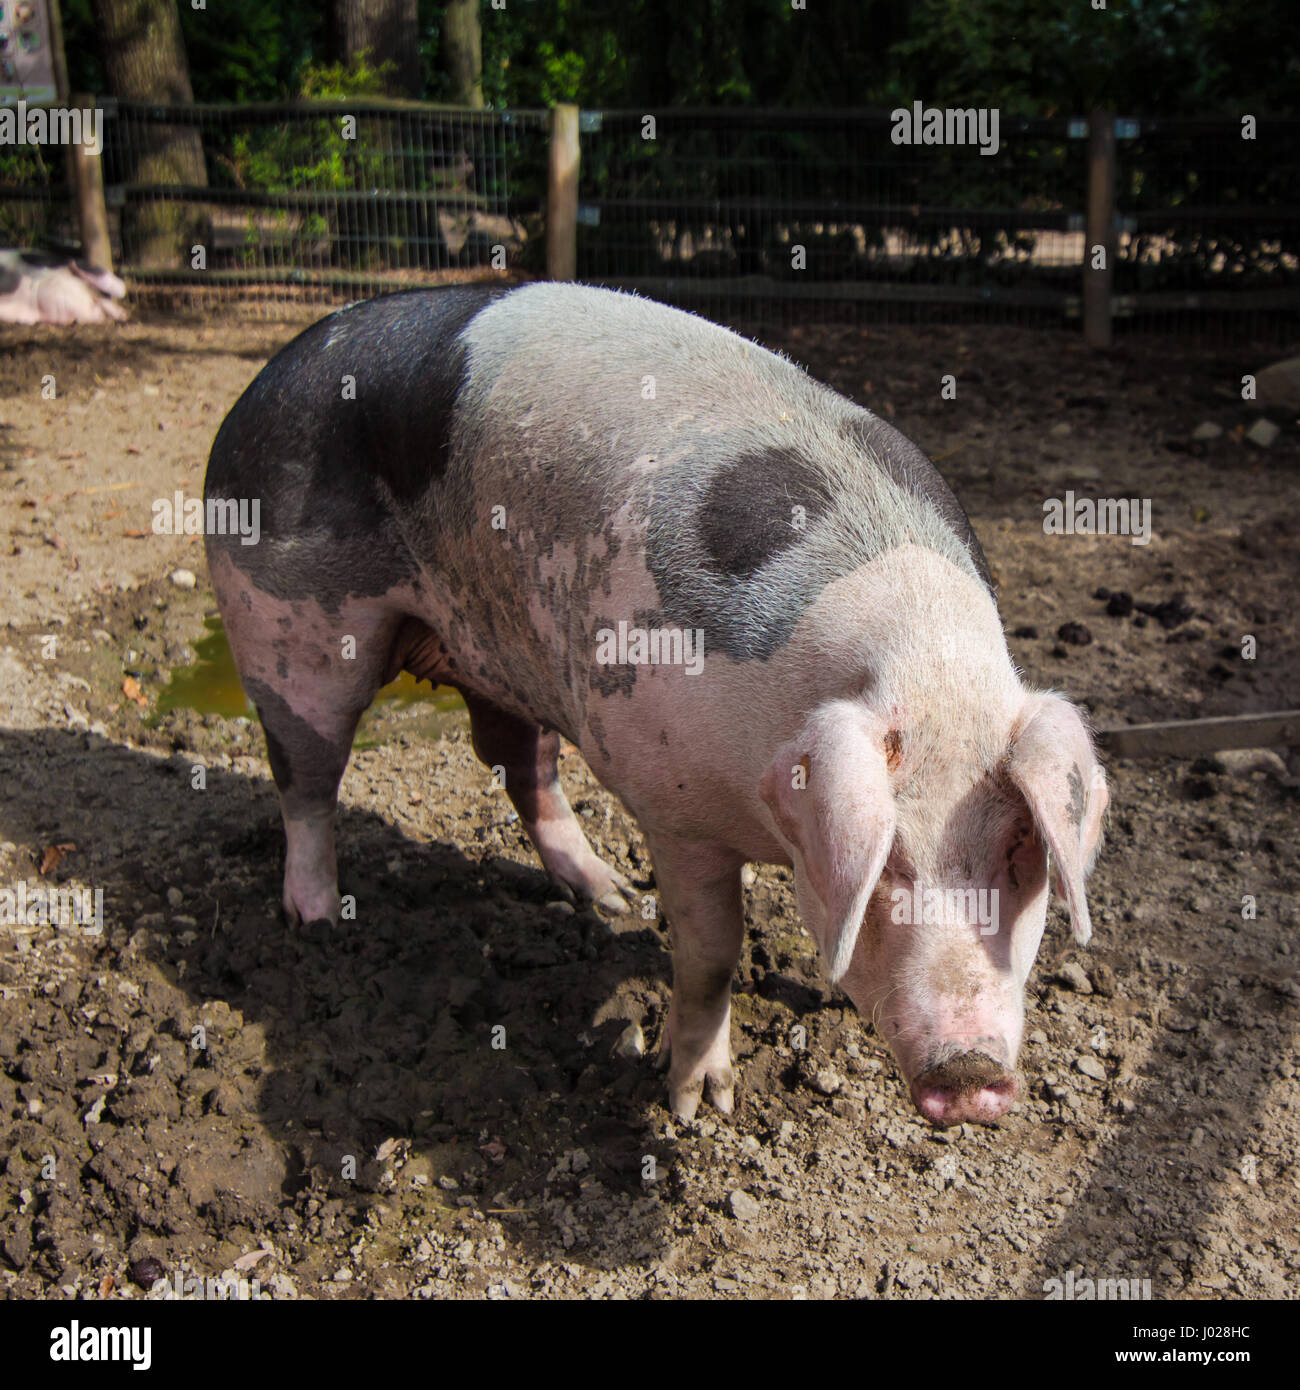 Big Pig Stock Photo, Royalty Free Image: 137733608